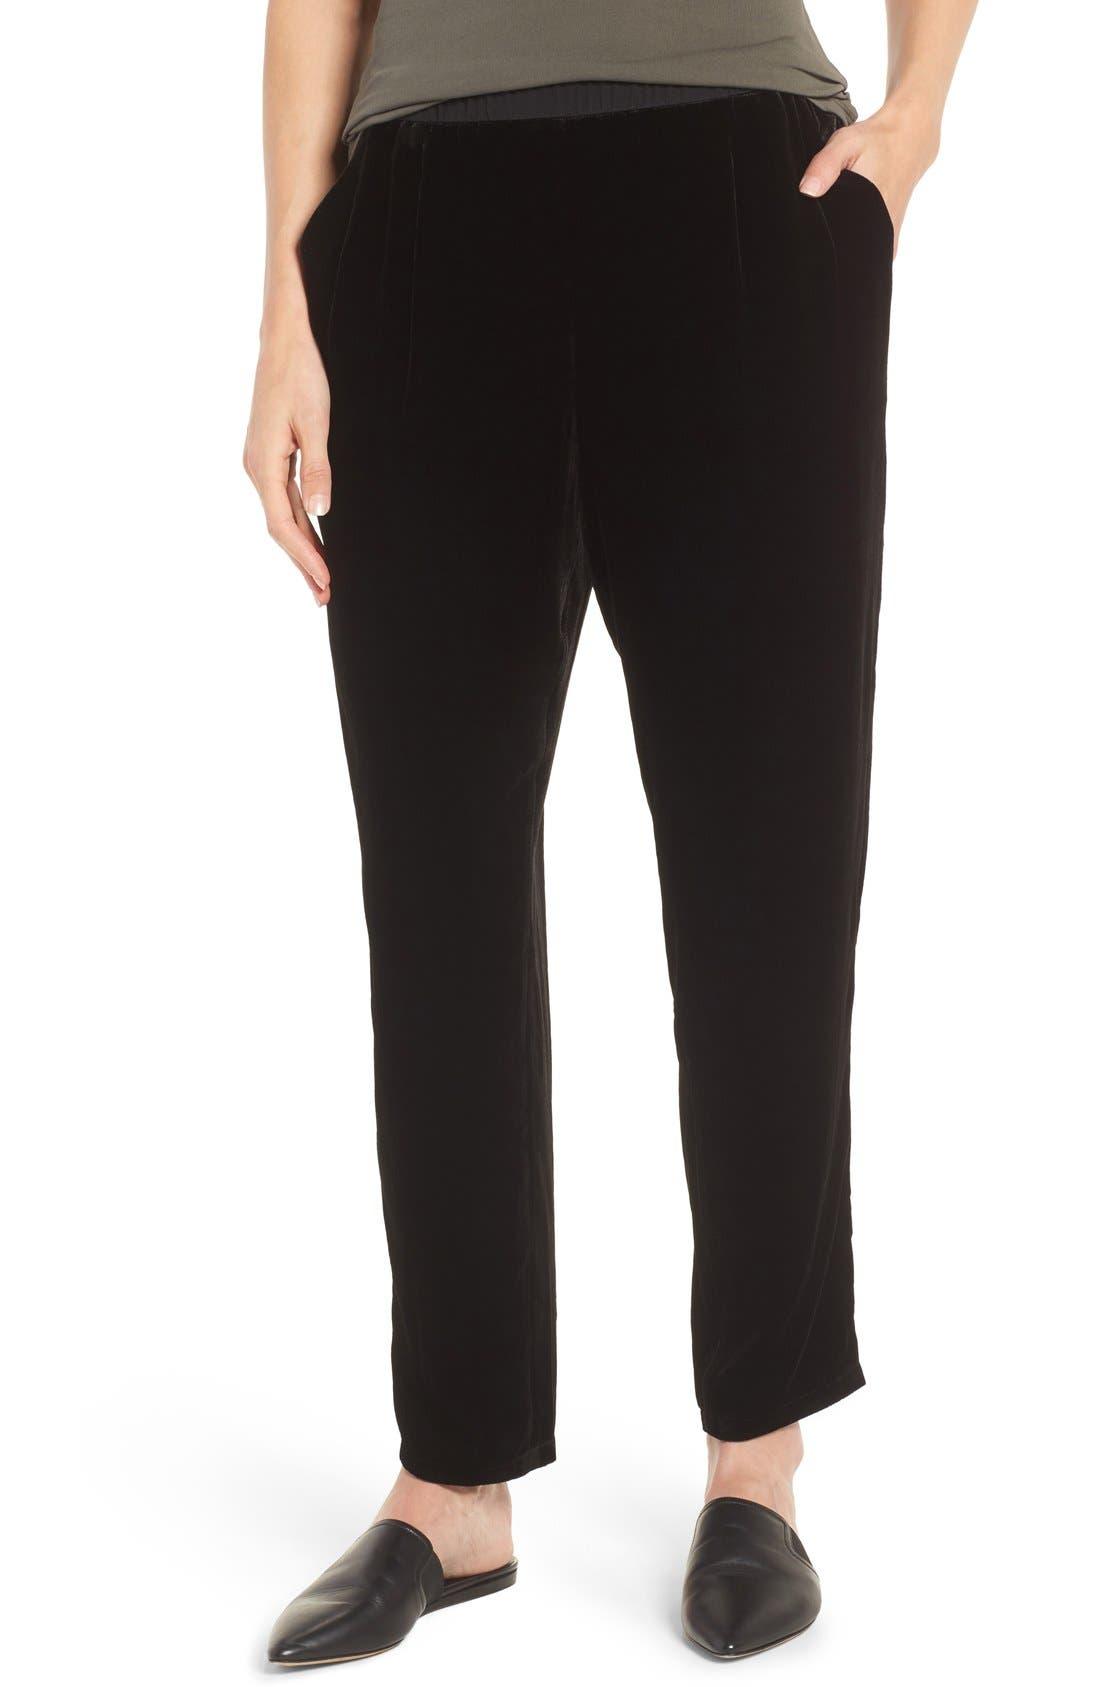 Velvet Ankle Pants,                             Main thumbnail 1, color,                             Black